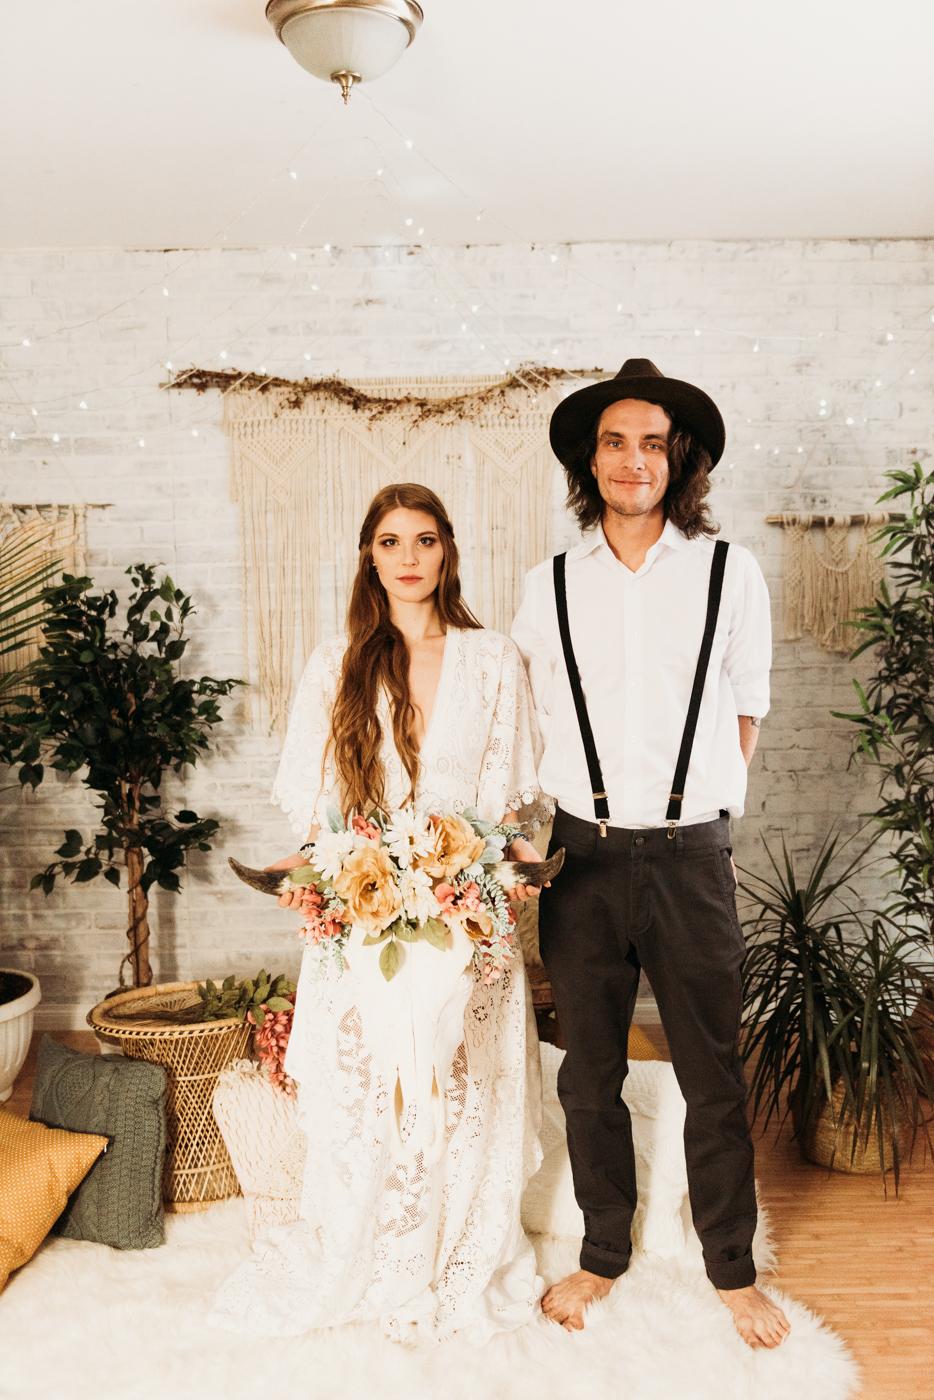 FortSt.John_photographer_TyraEPhotography_Wedding_Couple_Family_Photograhy_DawsonCreek_Elopement_Bride_Boduoir_Portraits-4739-2.jpg